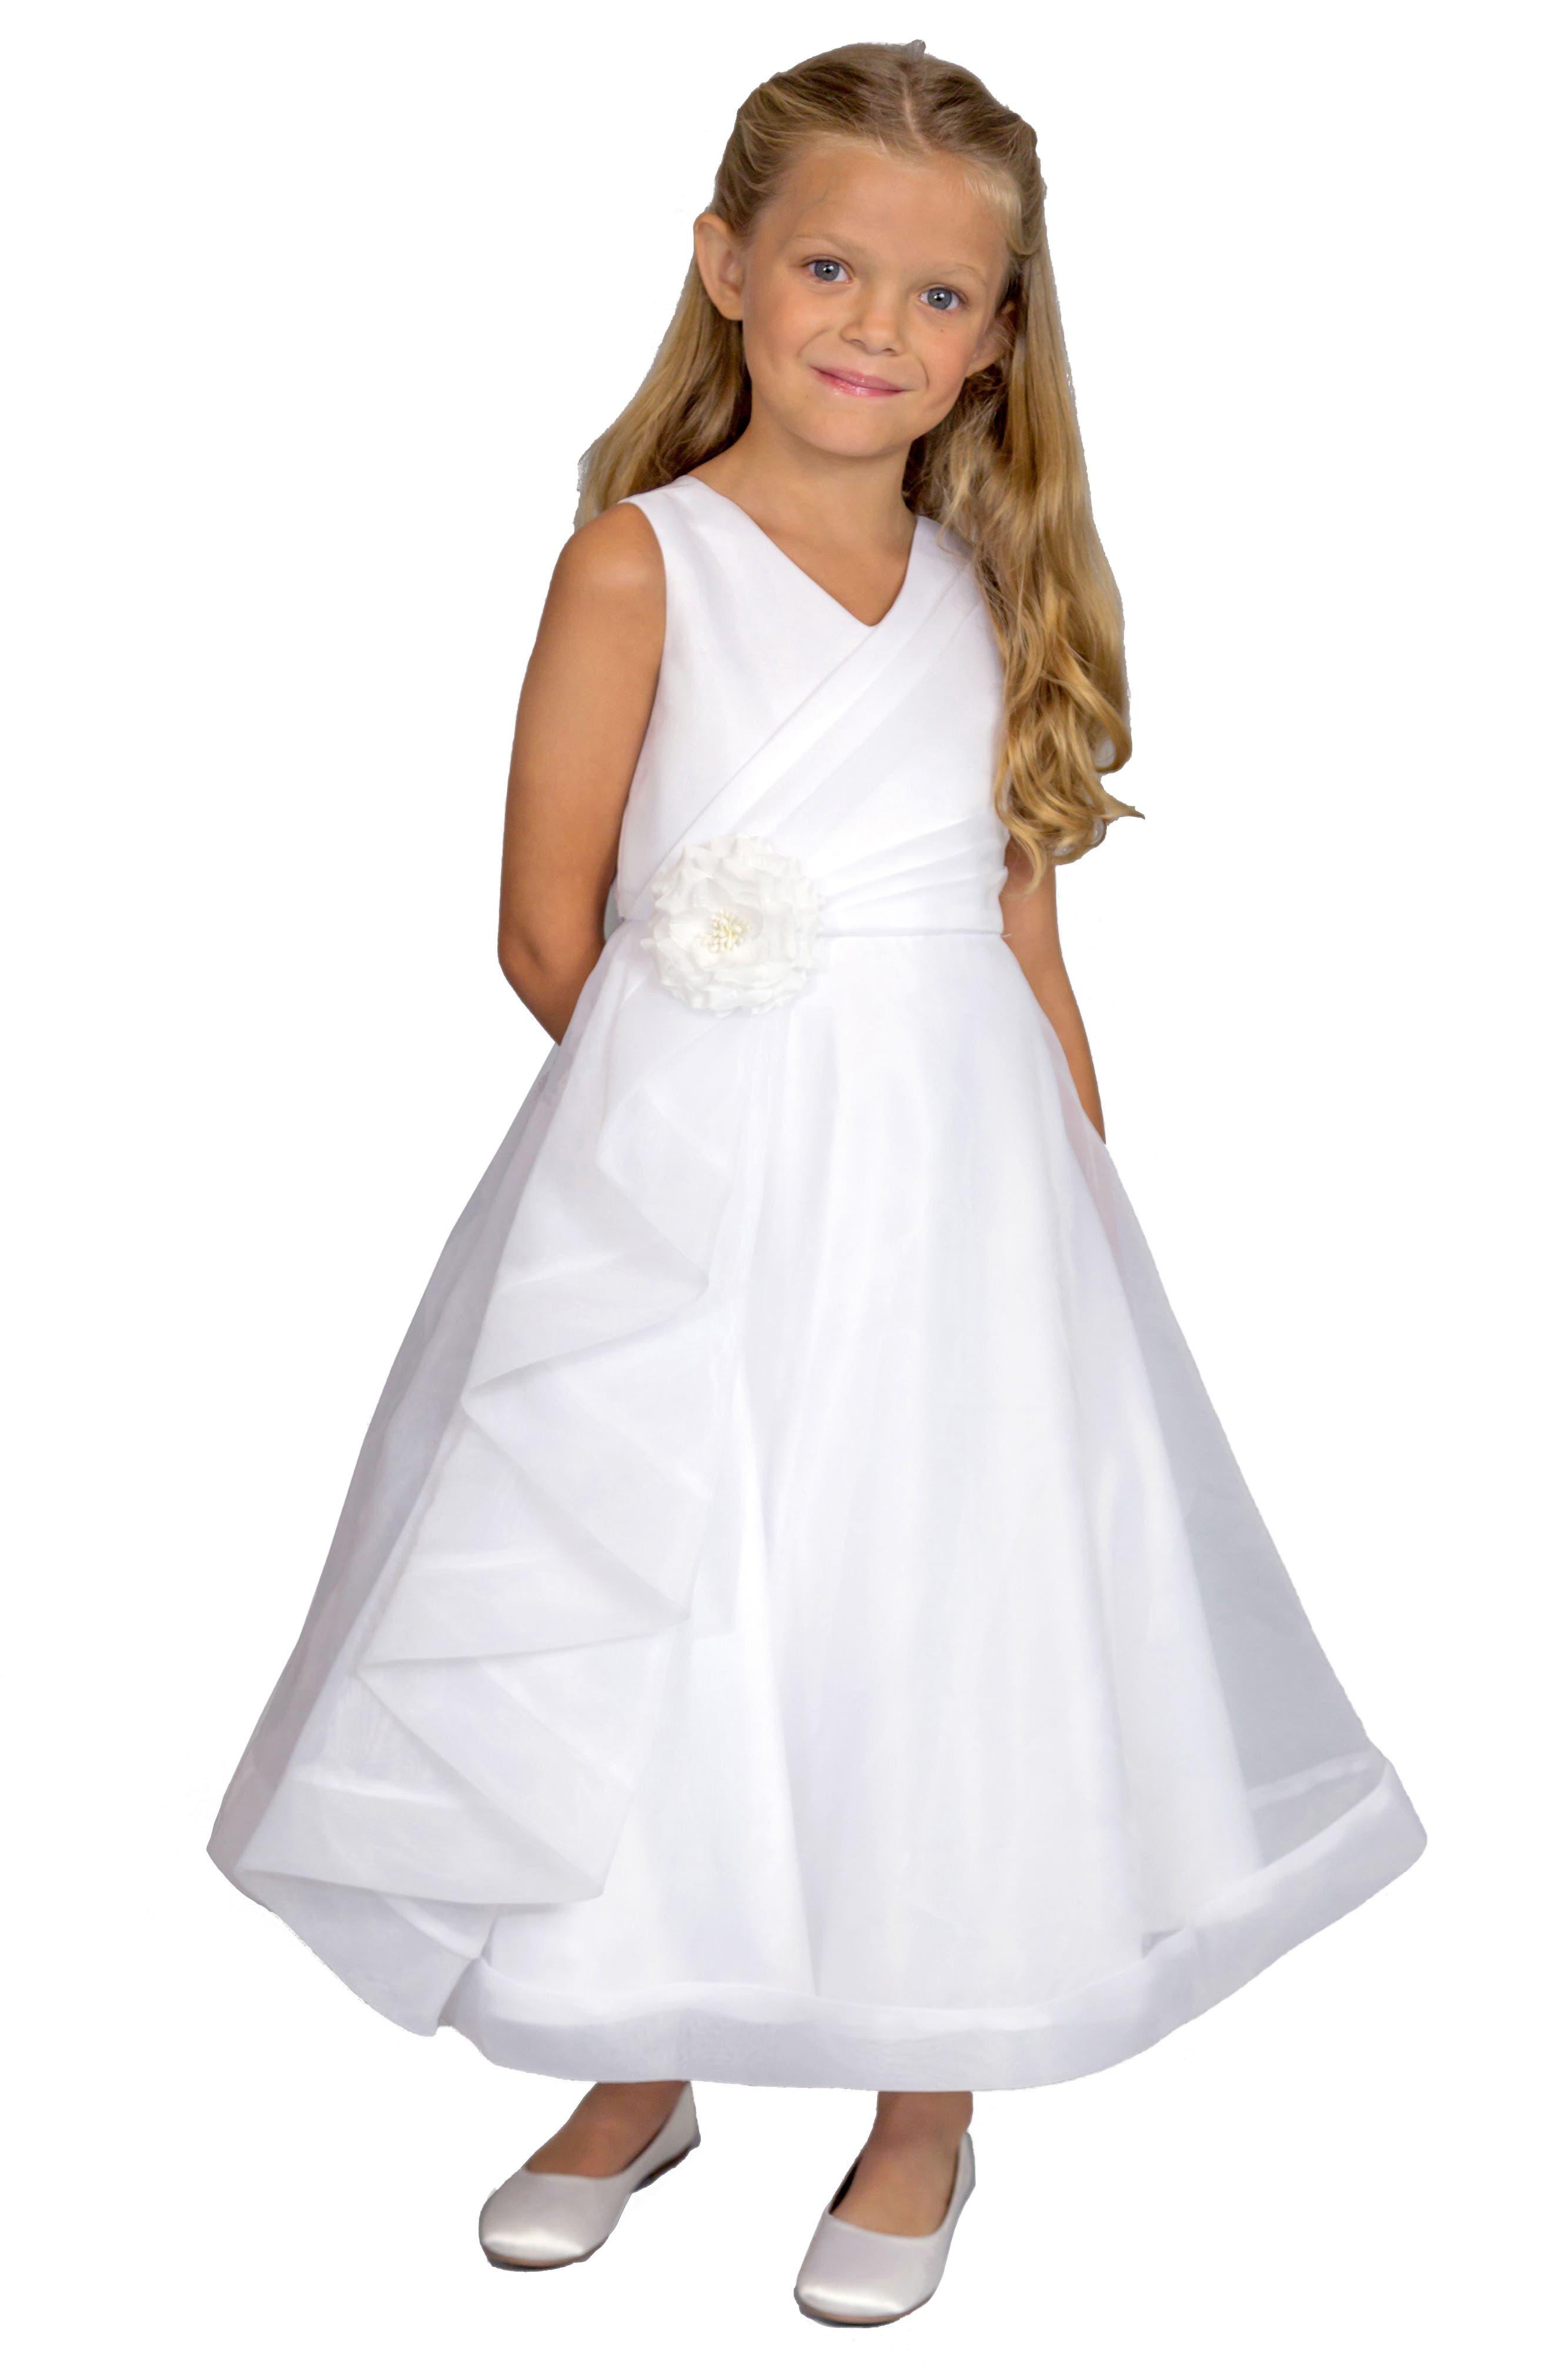 Alternate Image 1 Selected - Us Angels Ruffle Organza Dress (Little Girls & Big Girls)